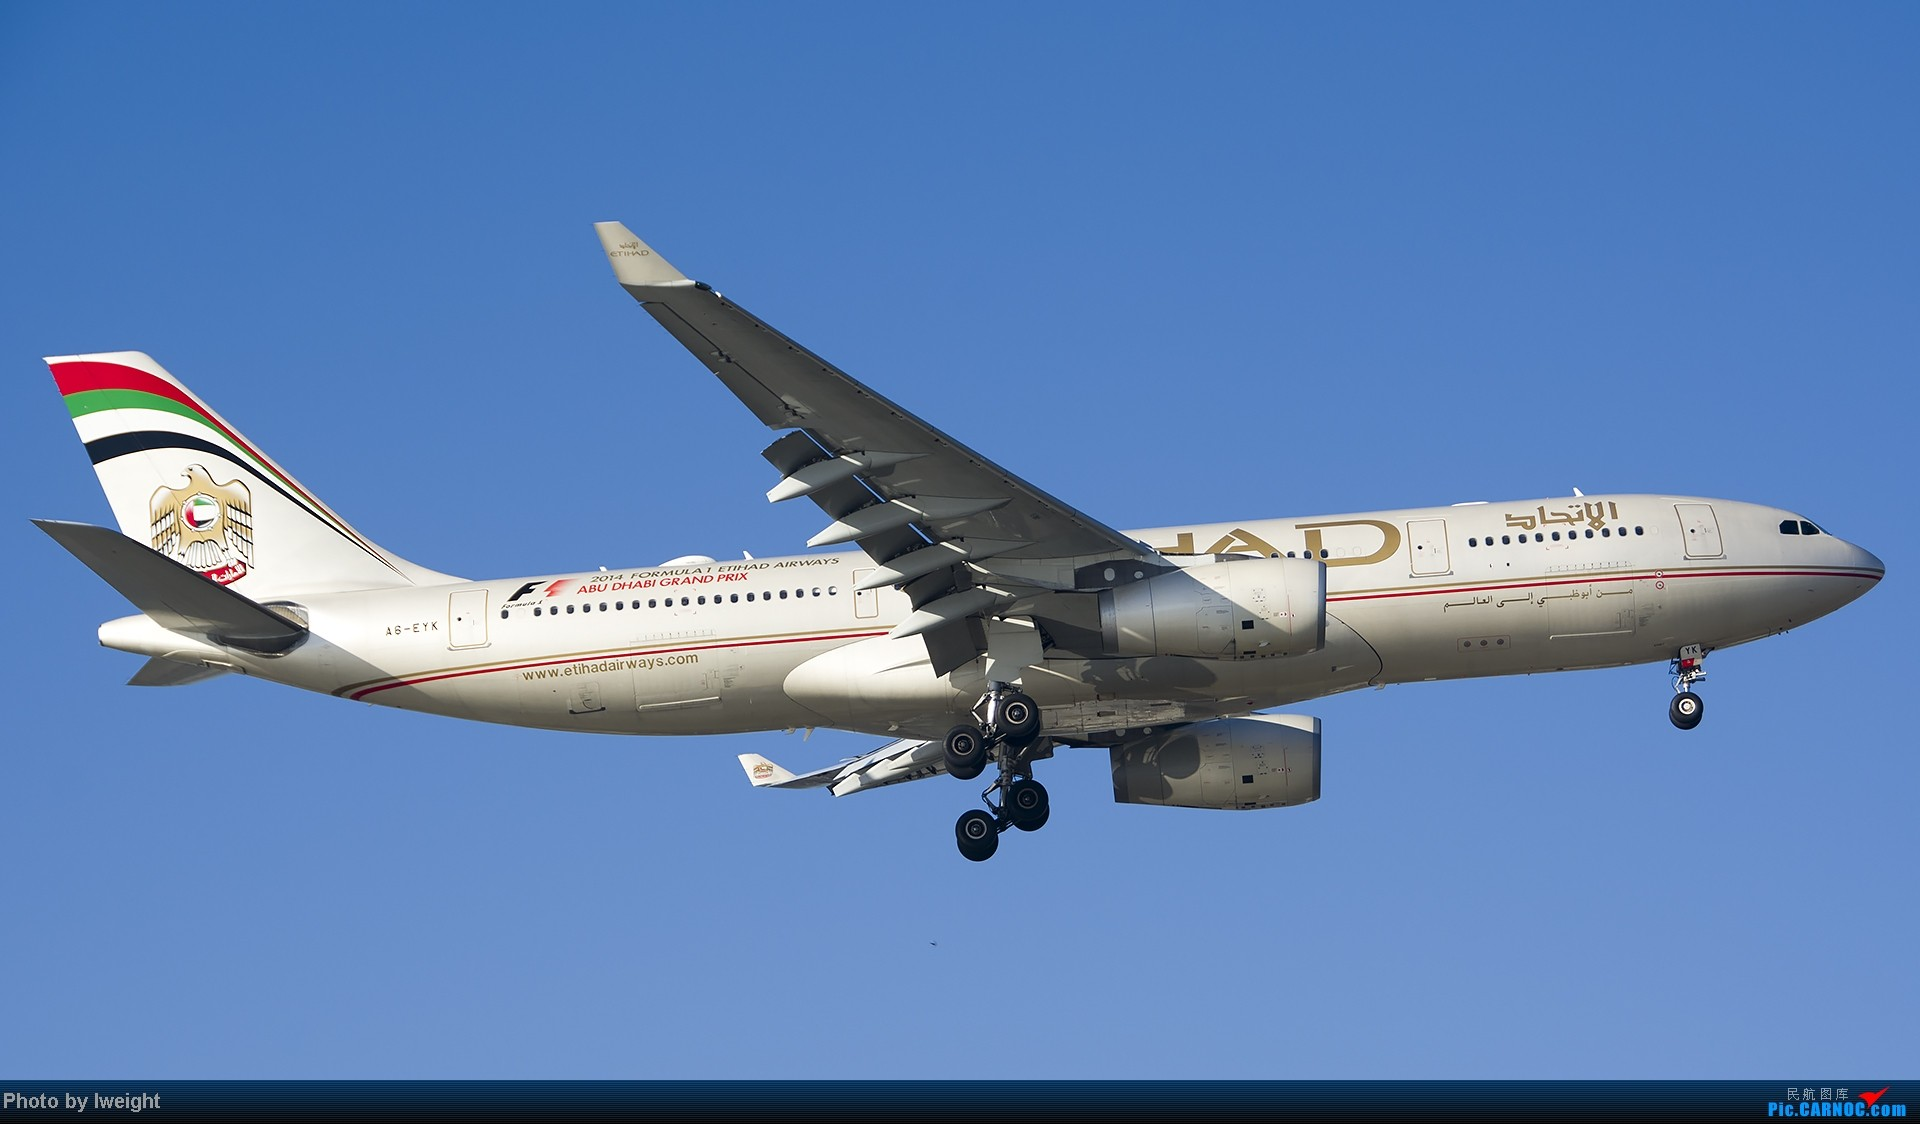 Re:[原创]抓住APEC蓝的尾巴,再拍上一组 AIRBUS A330-200 A6-EYK 中国北京首都机场